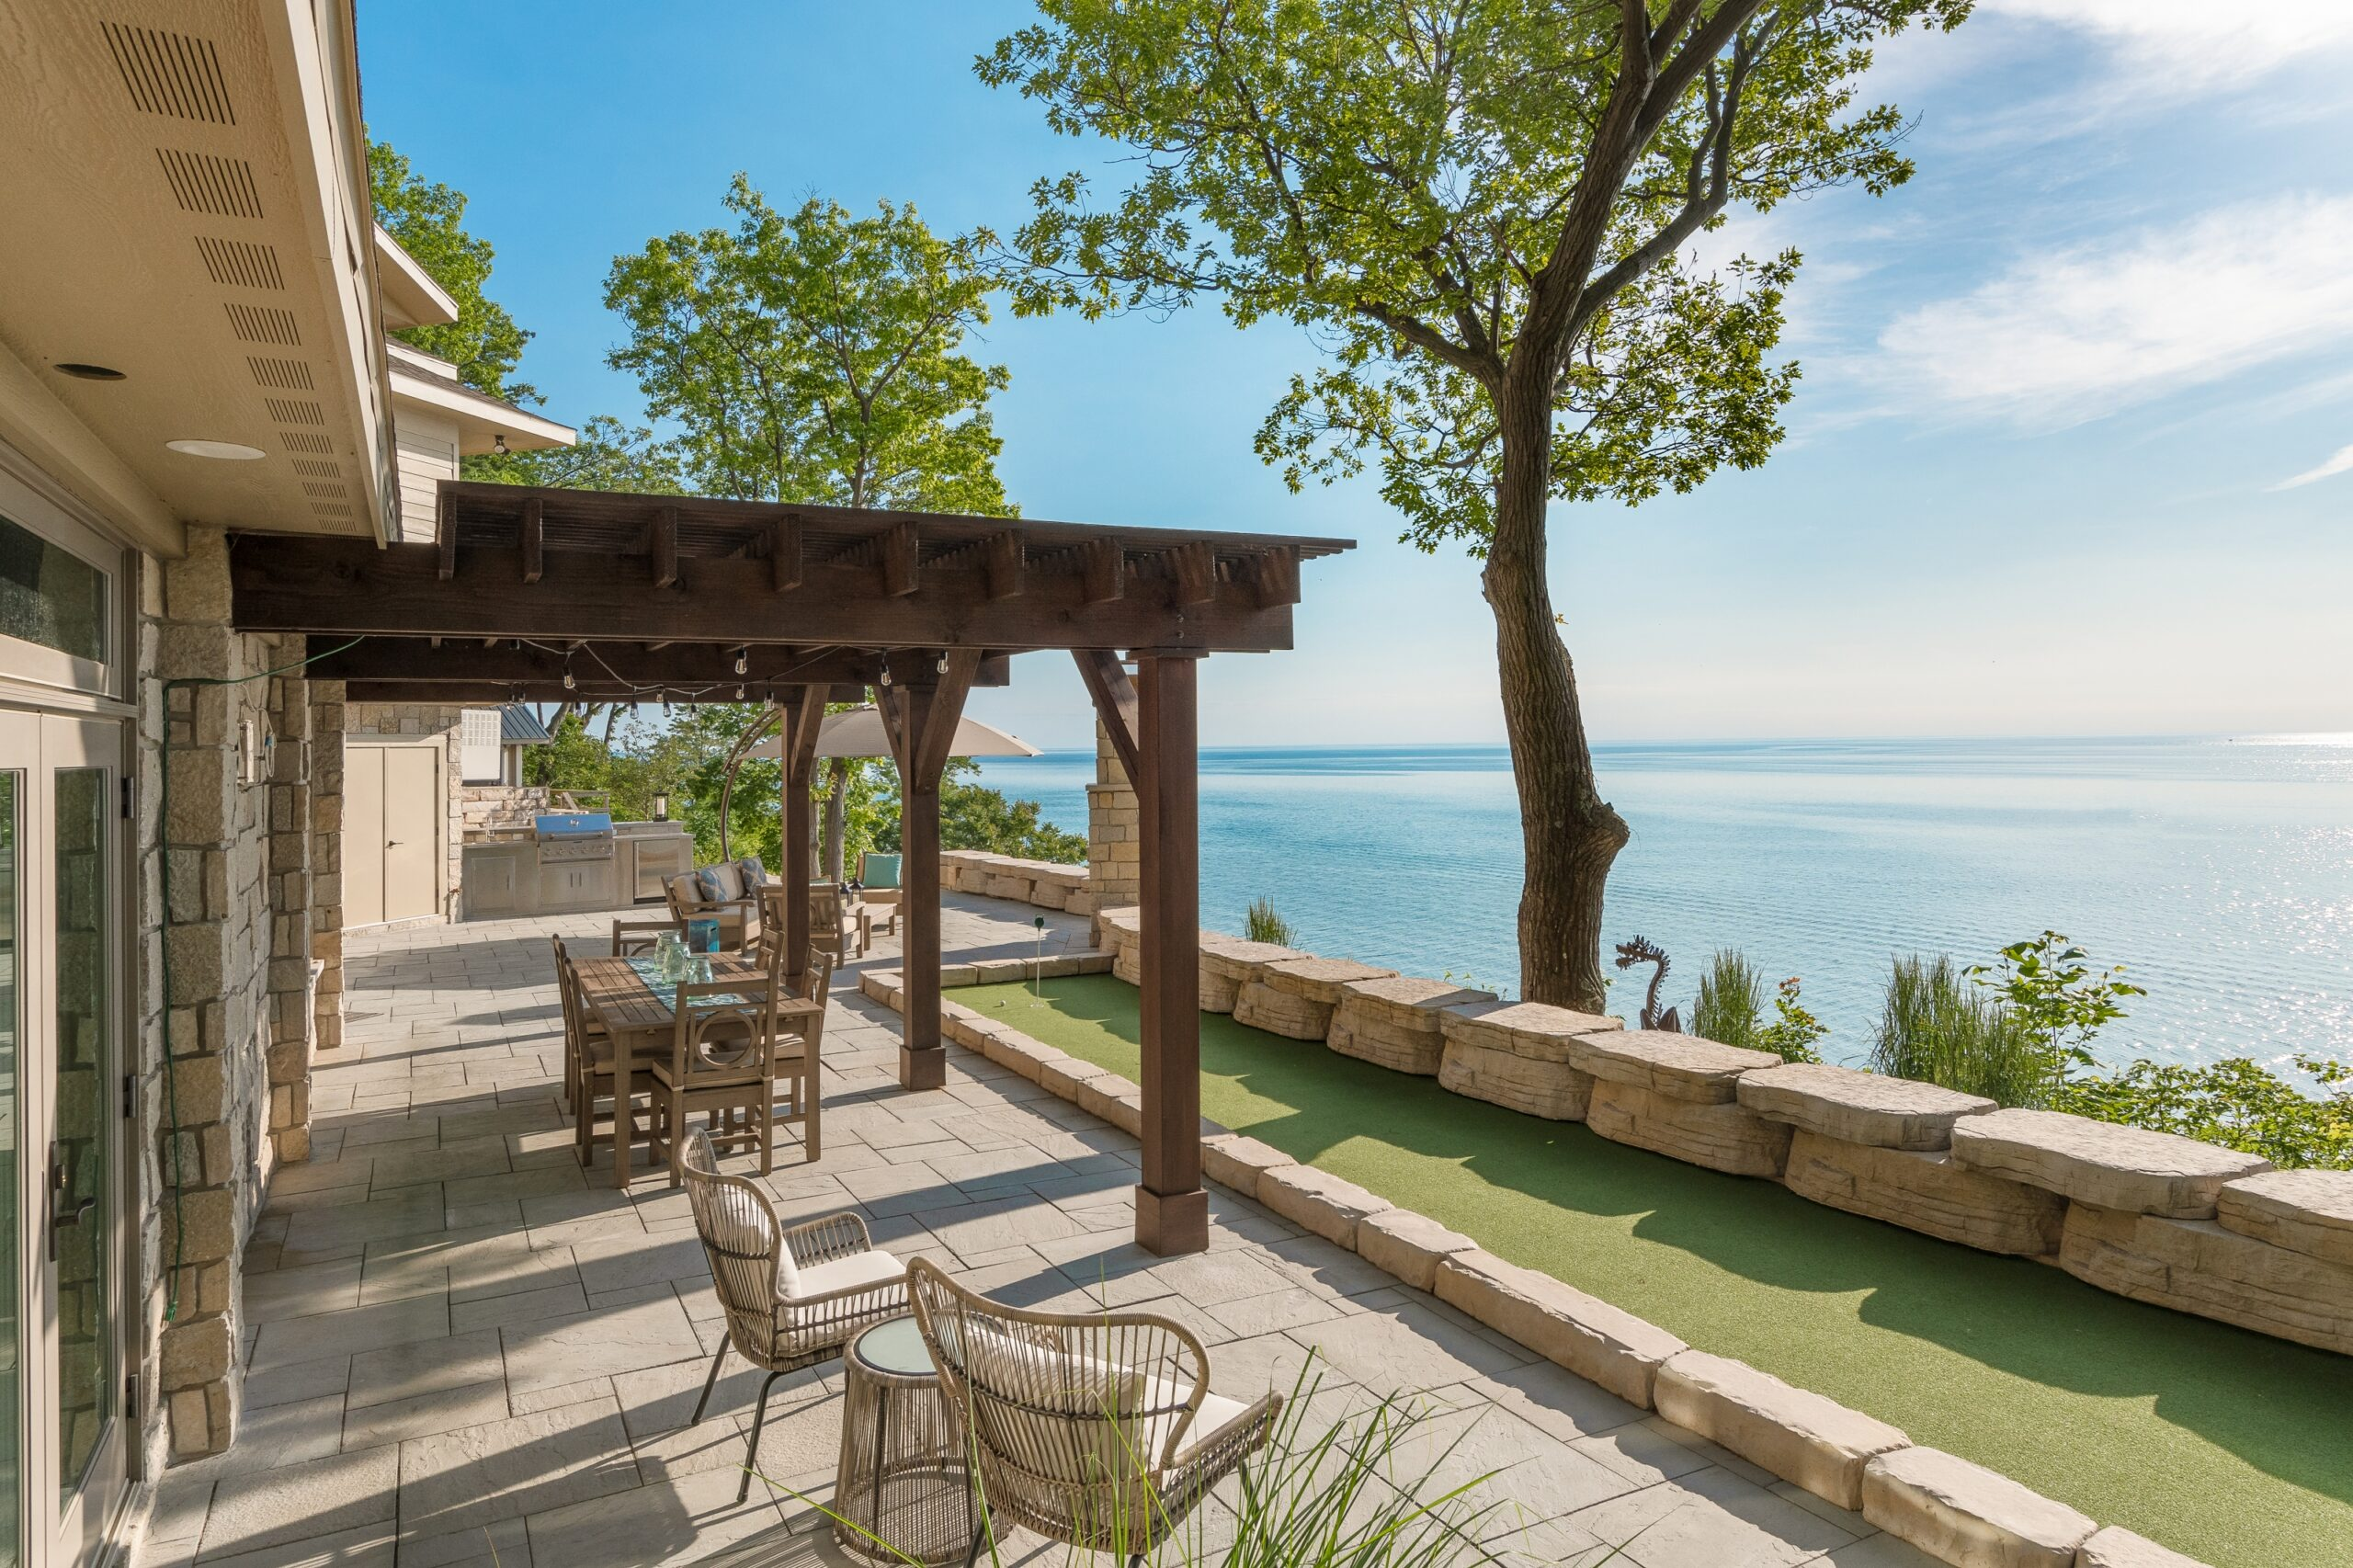 Outdoor Custom Home Development Project on Lake Michigan